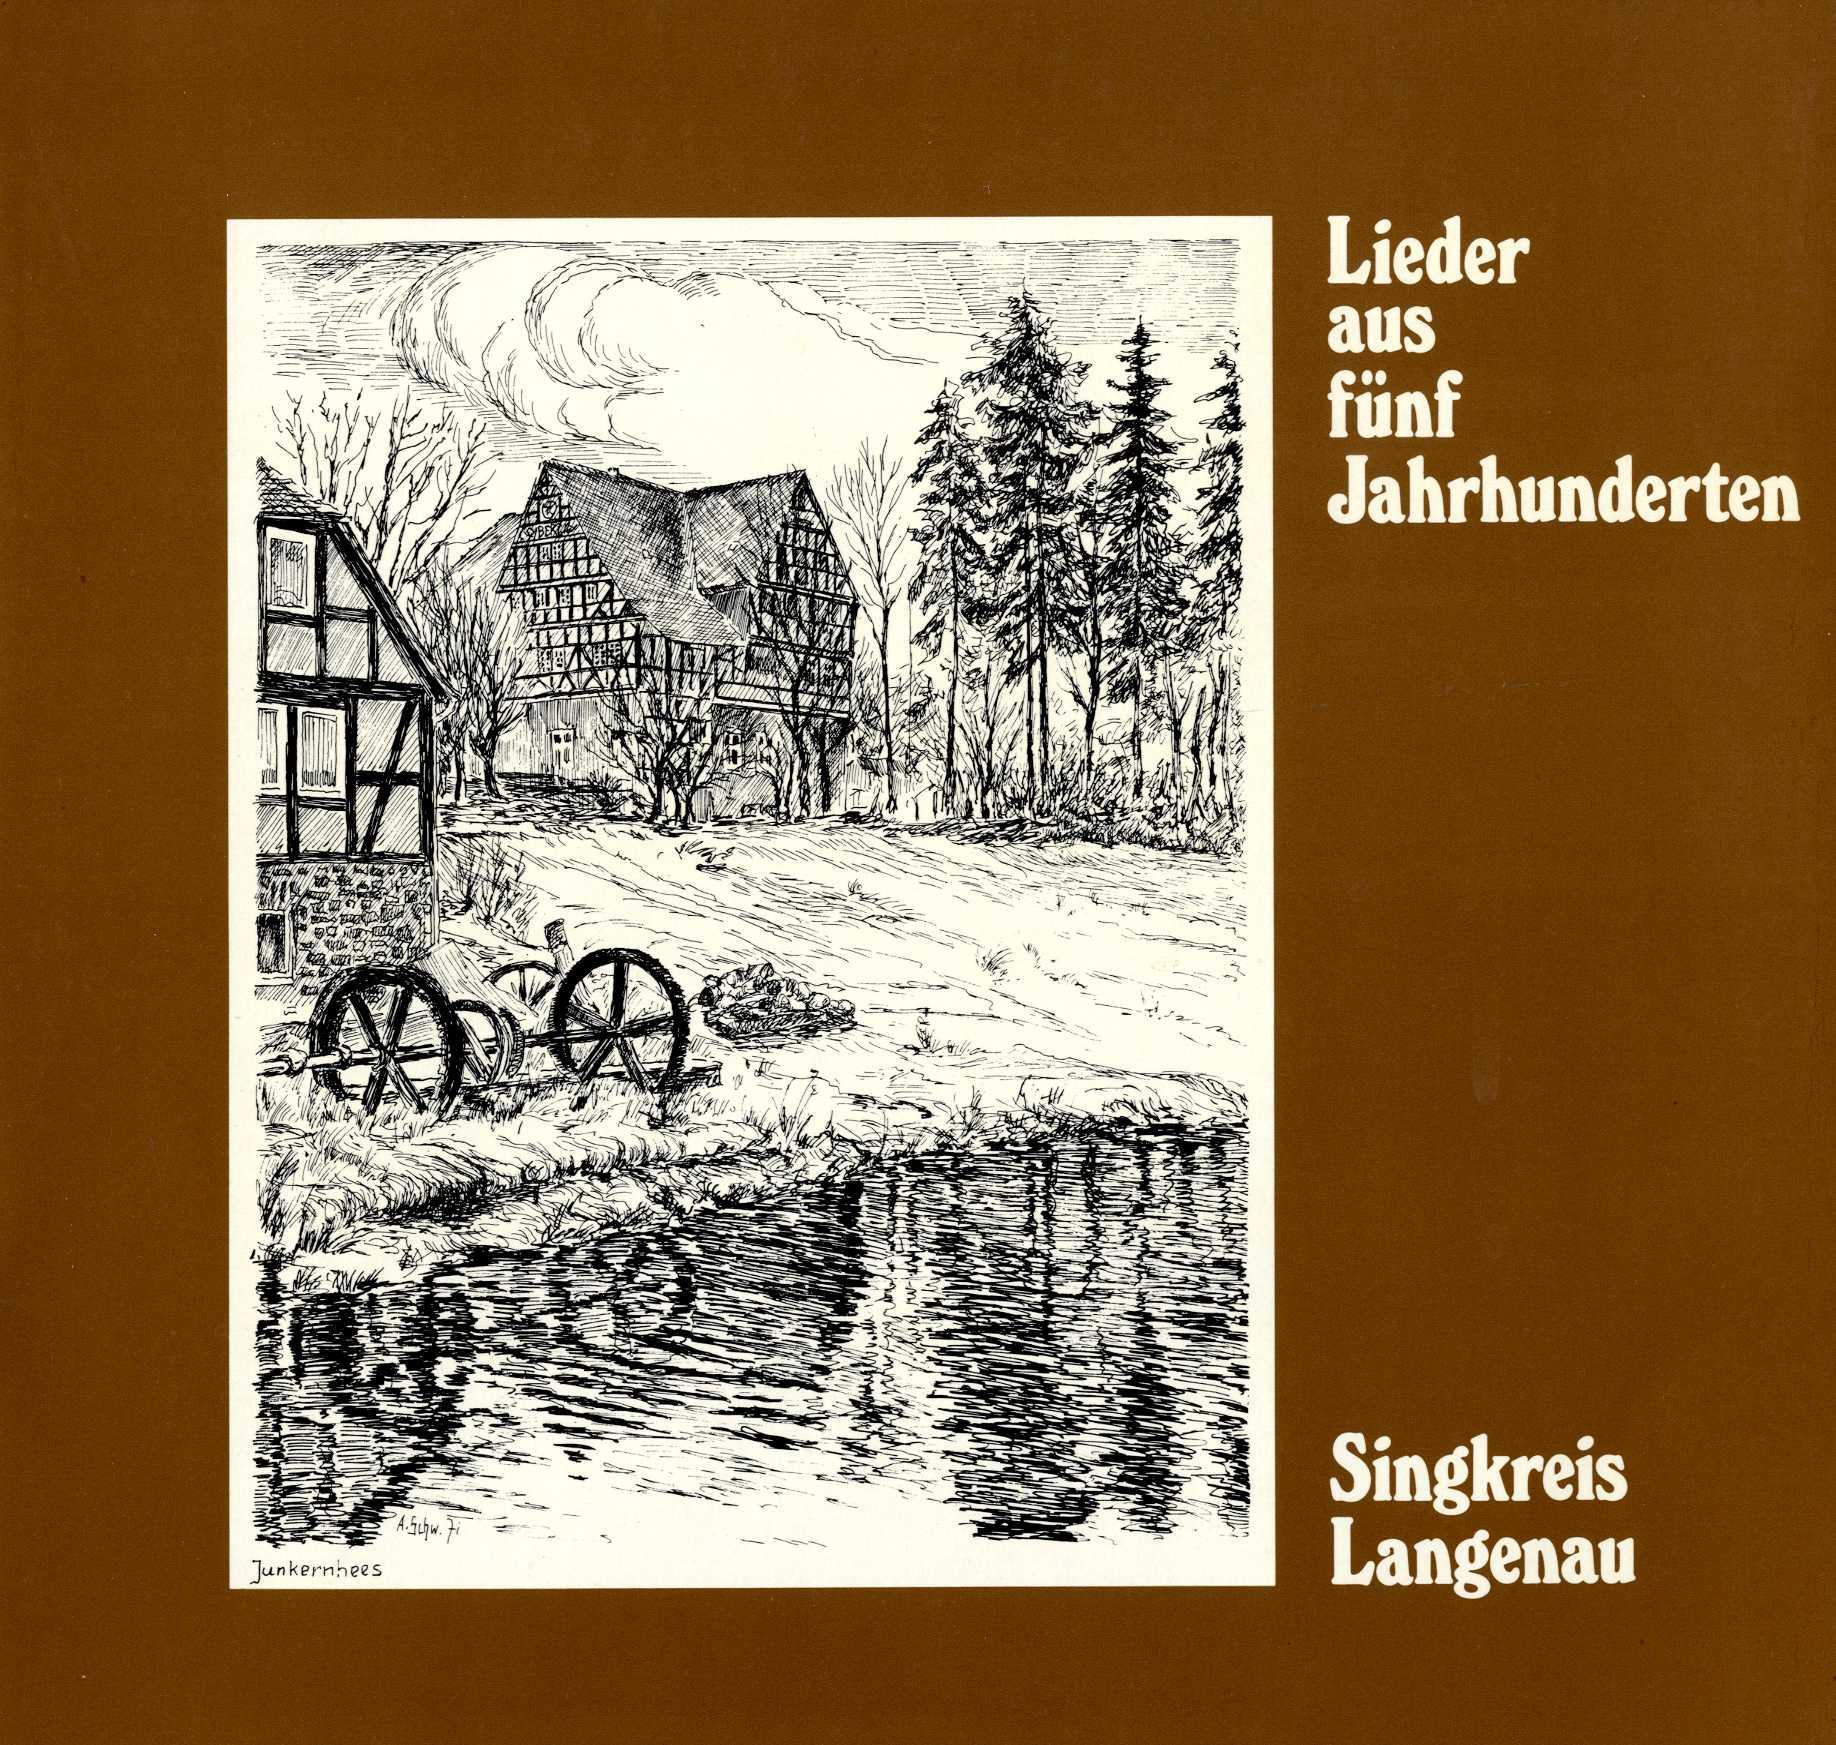 Singkreis-Langenau-Vorderseite